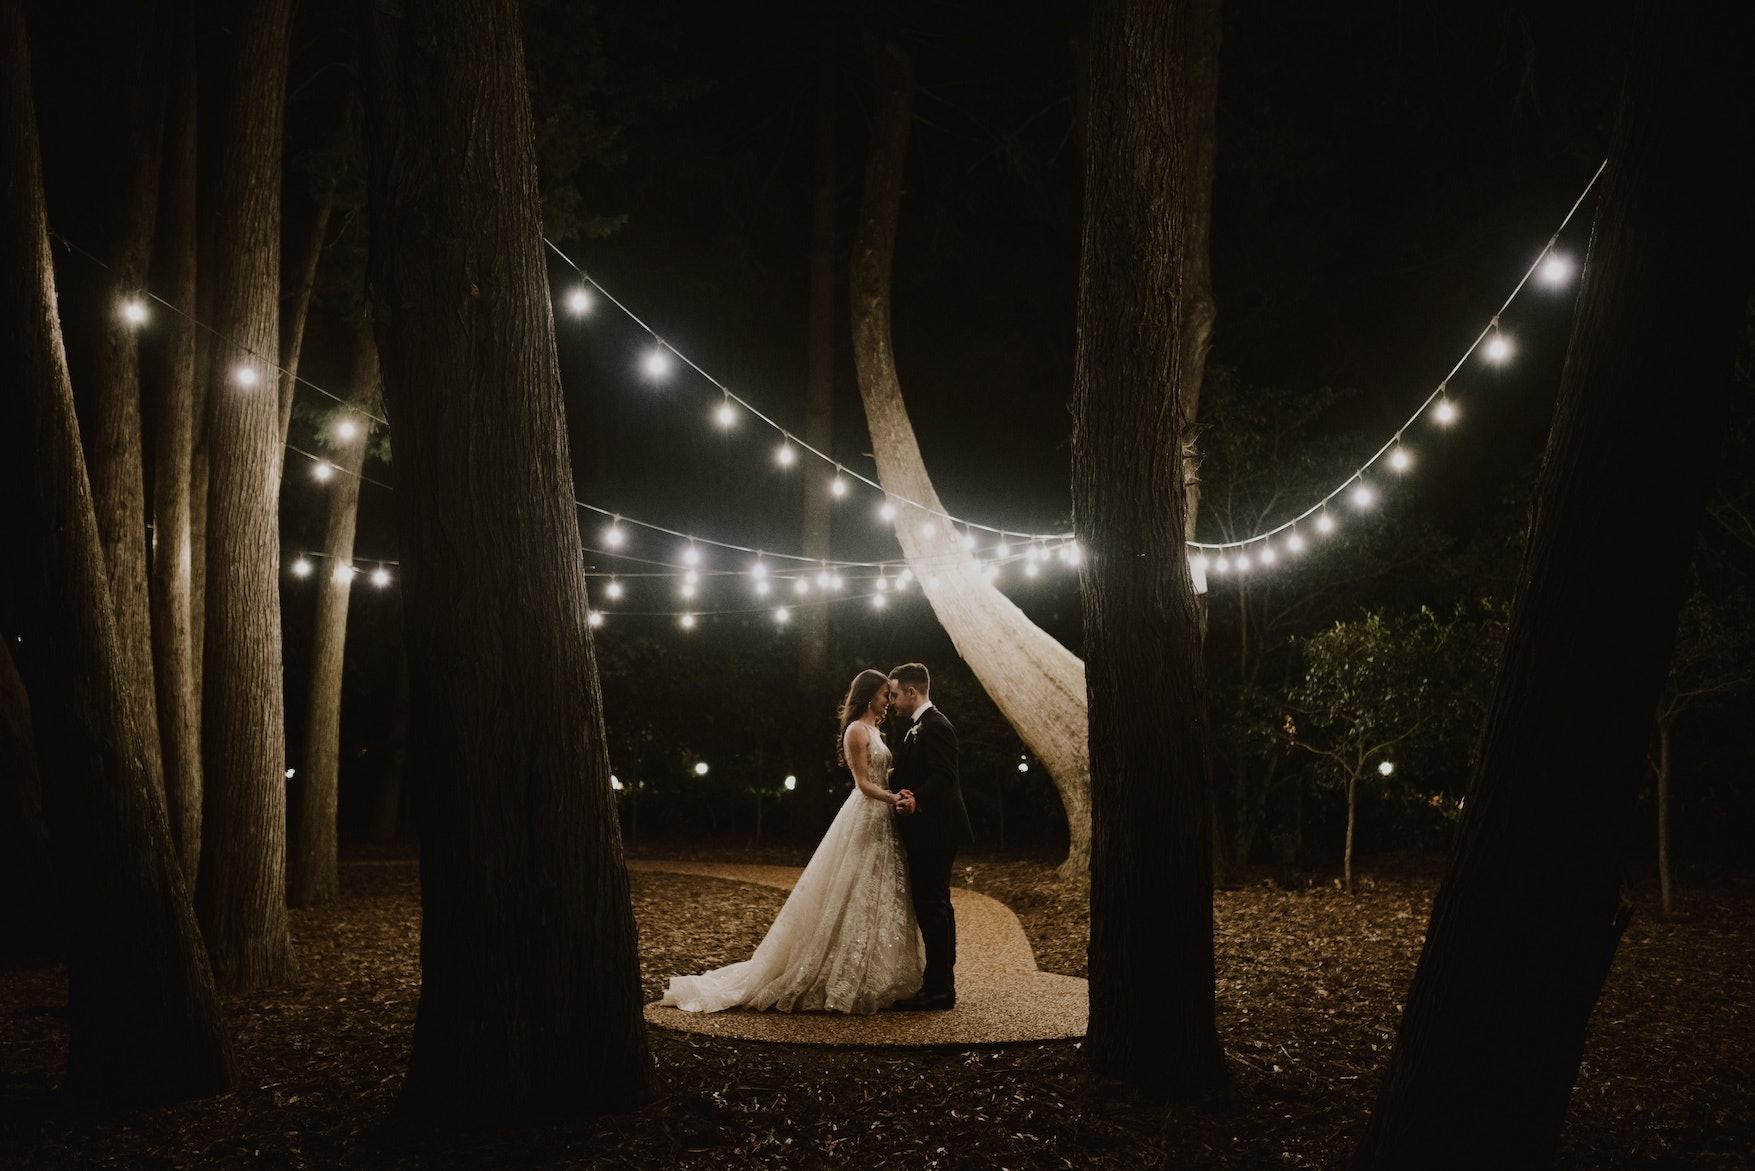 Bride and groom standing under festoon lights at night